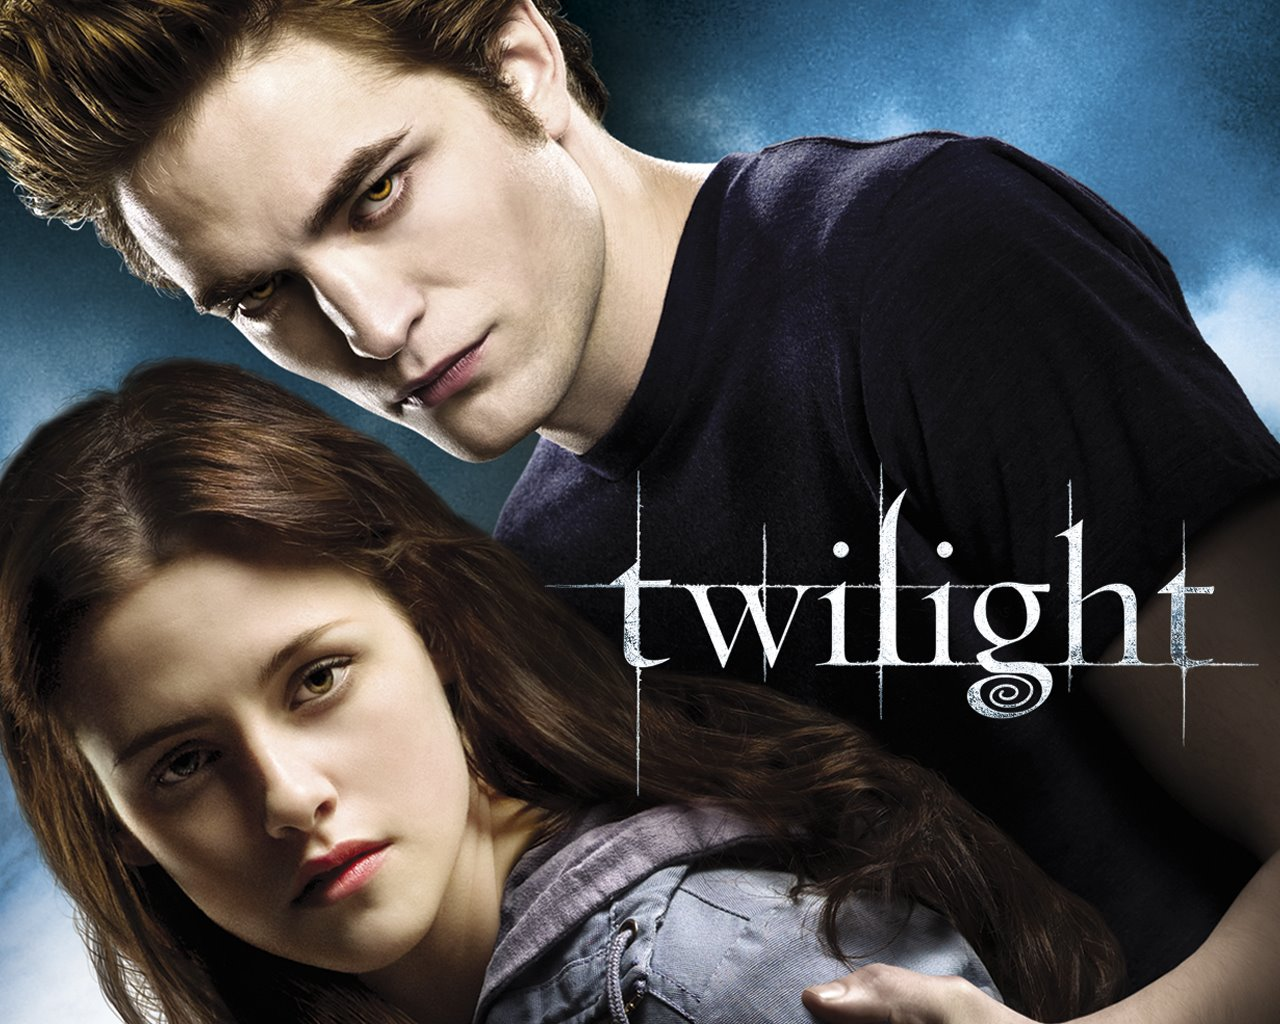 http://4.bp.blogspot.com/-m-gknnnMCgs/UDWe2QSGFcI/AAAAAAAAAWc/GWIakeK5Gao/s1600/Bella,+Edward,+Twilight.jpg